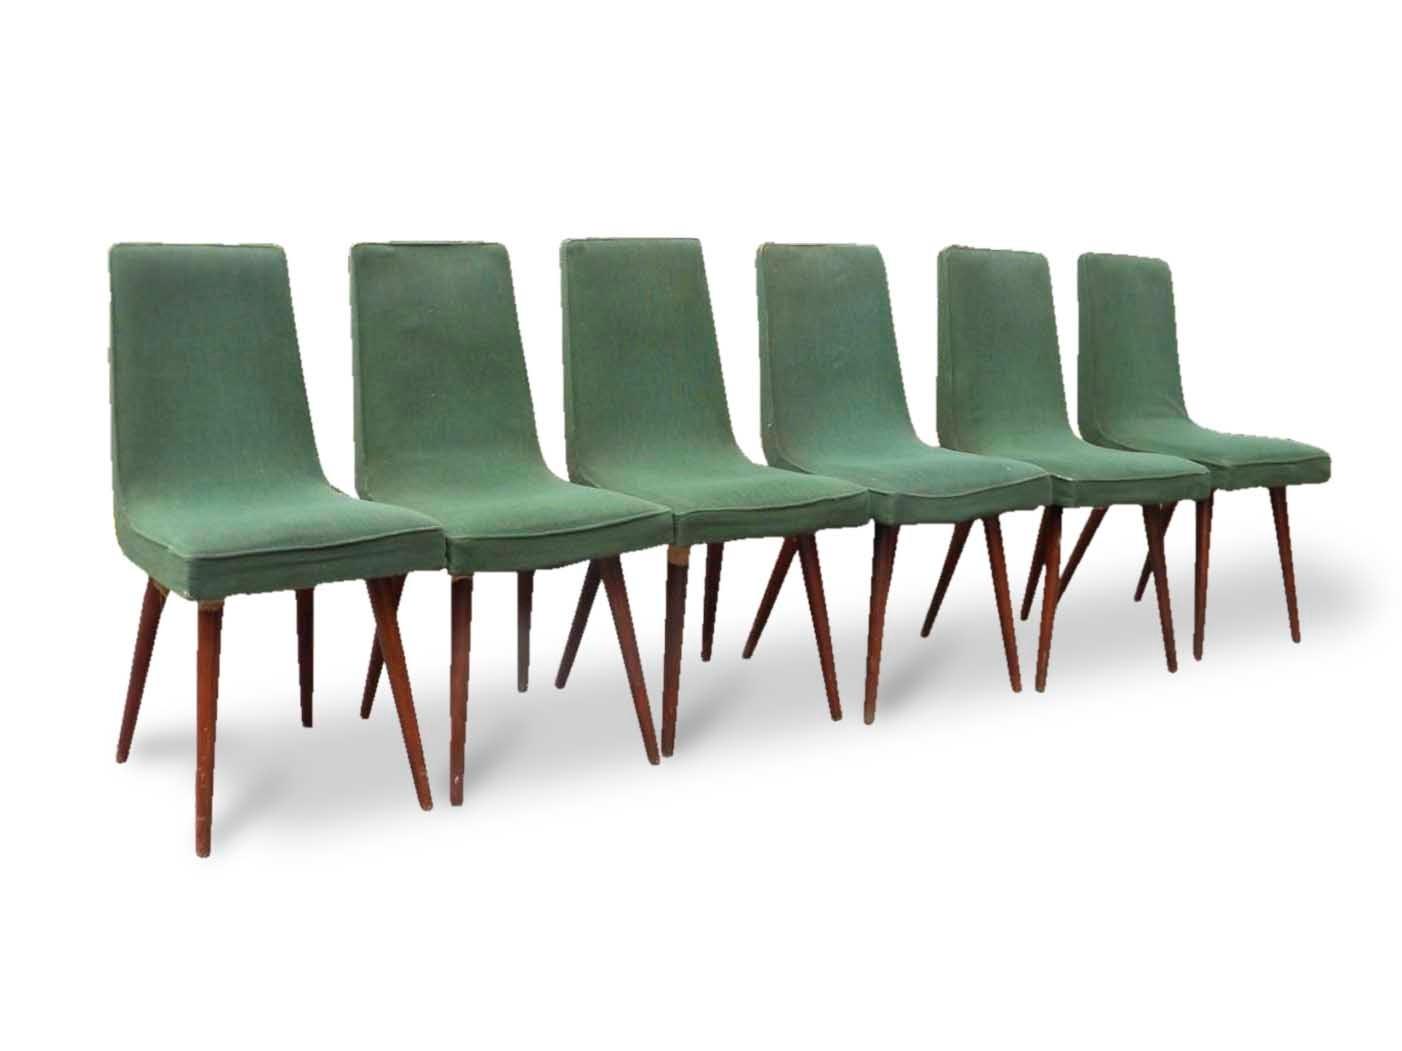 Sedie vintage anni 50 italian vintage sofa for Sedie design anni 20